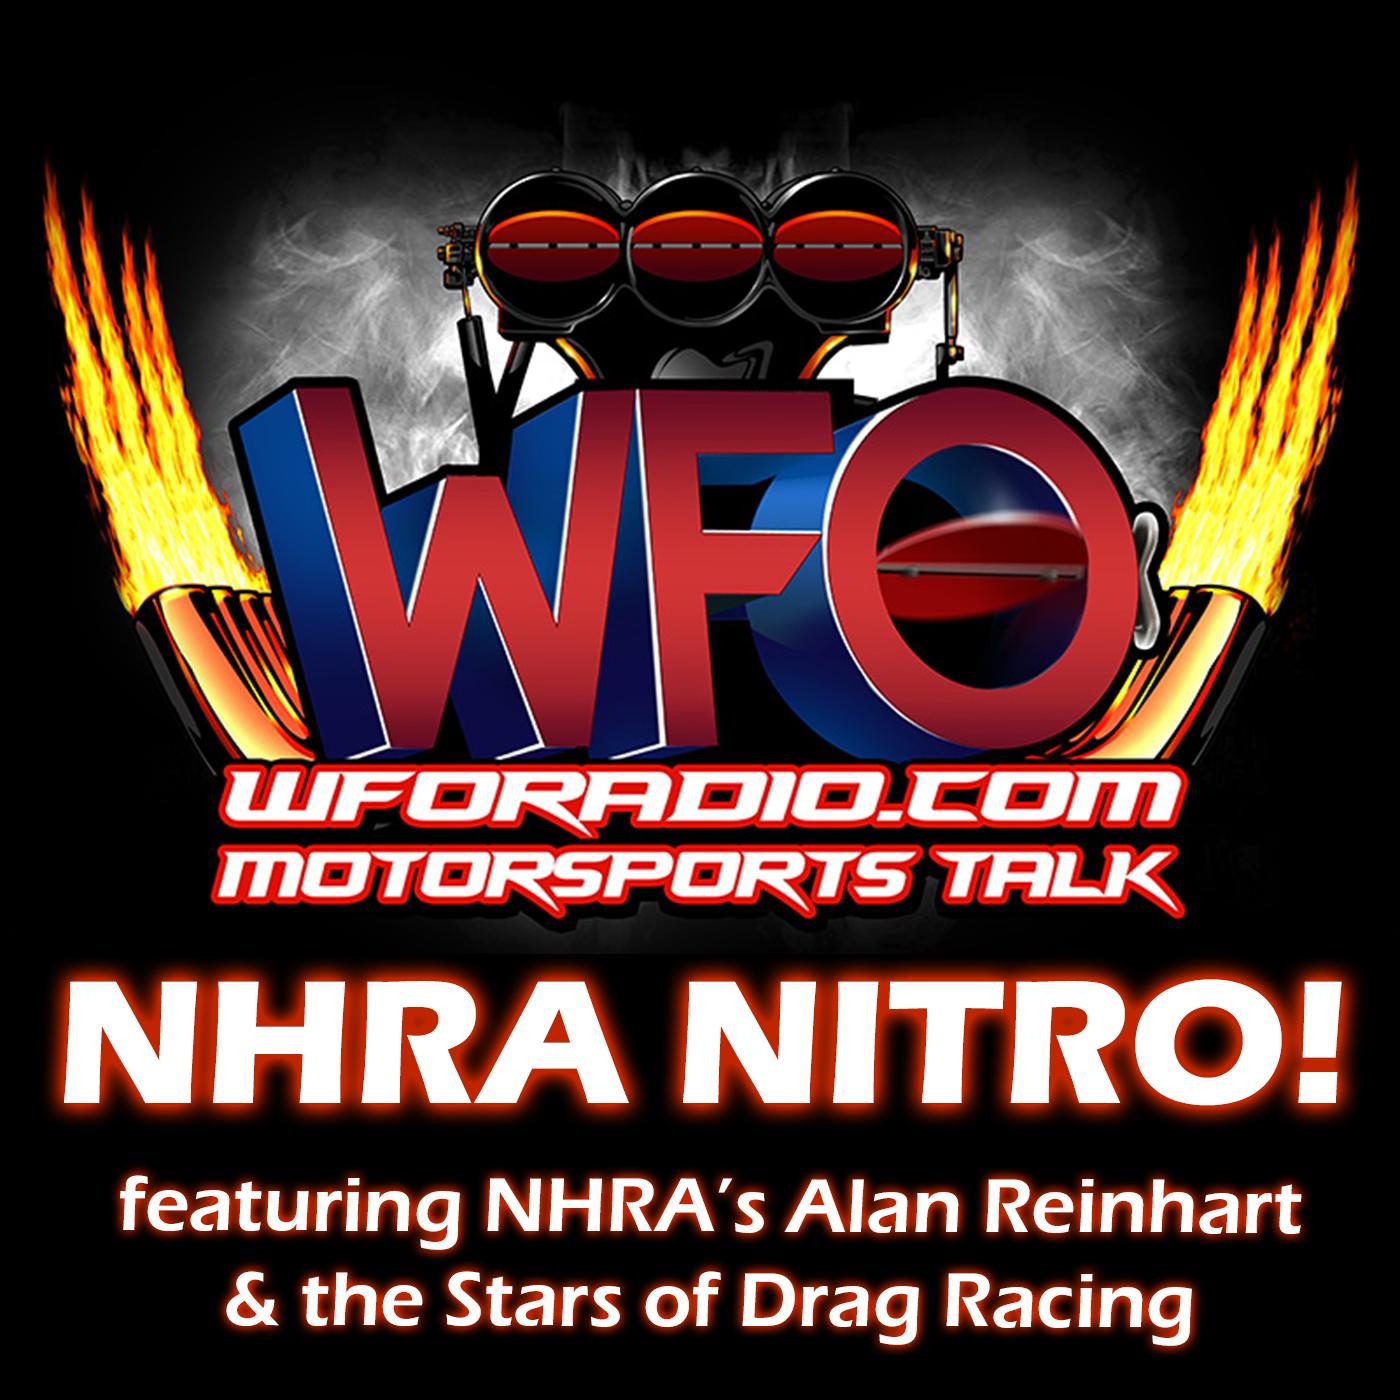 WFO Radio NHRA Nitro!